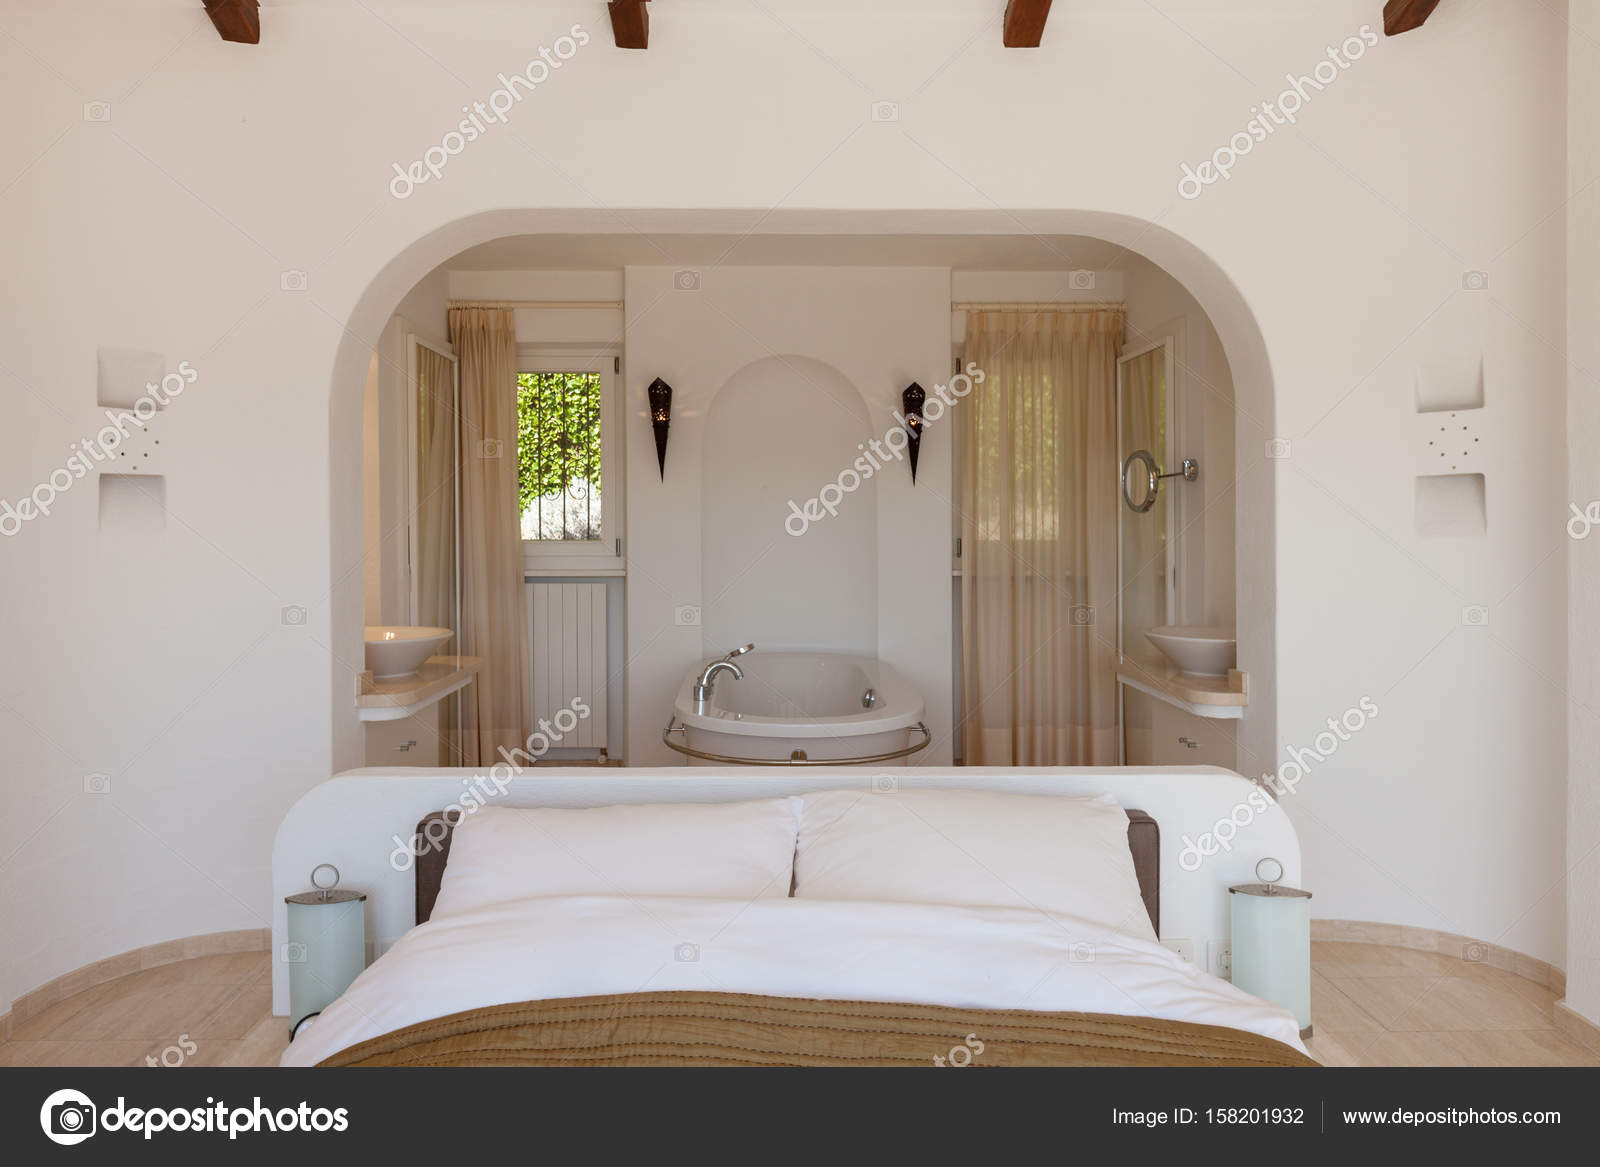 Elegante slaapkamer met bad — Stockfoto © Zveiger #158201932